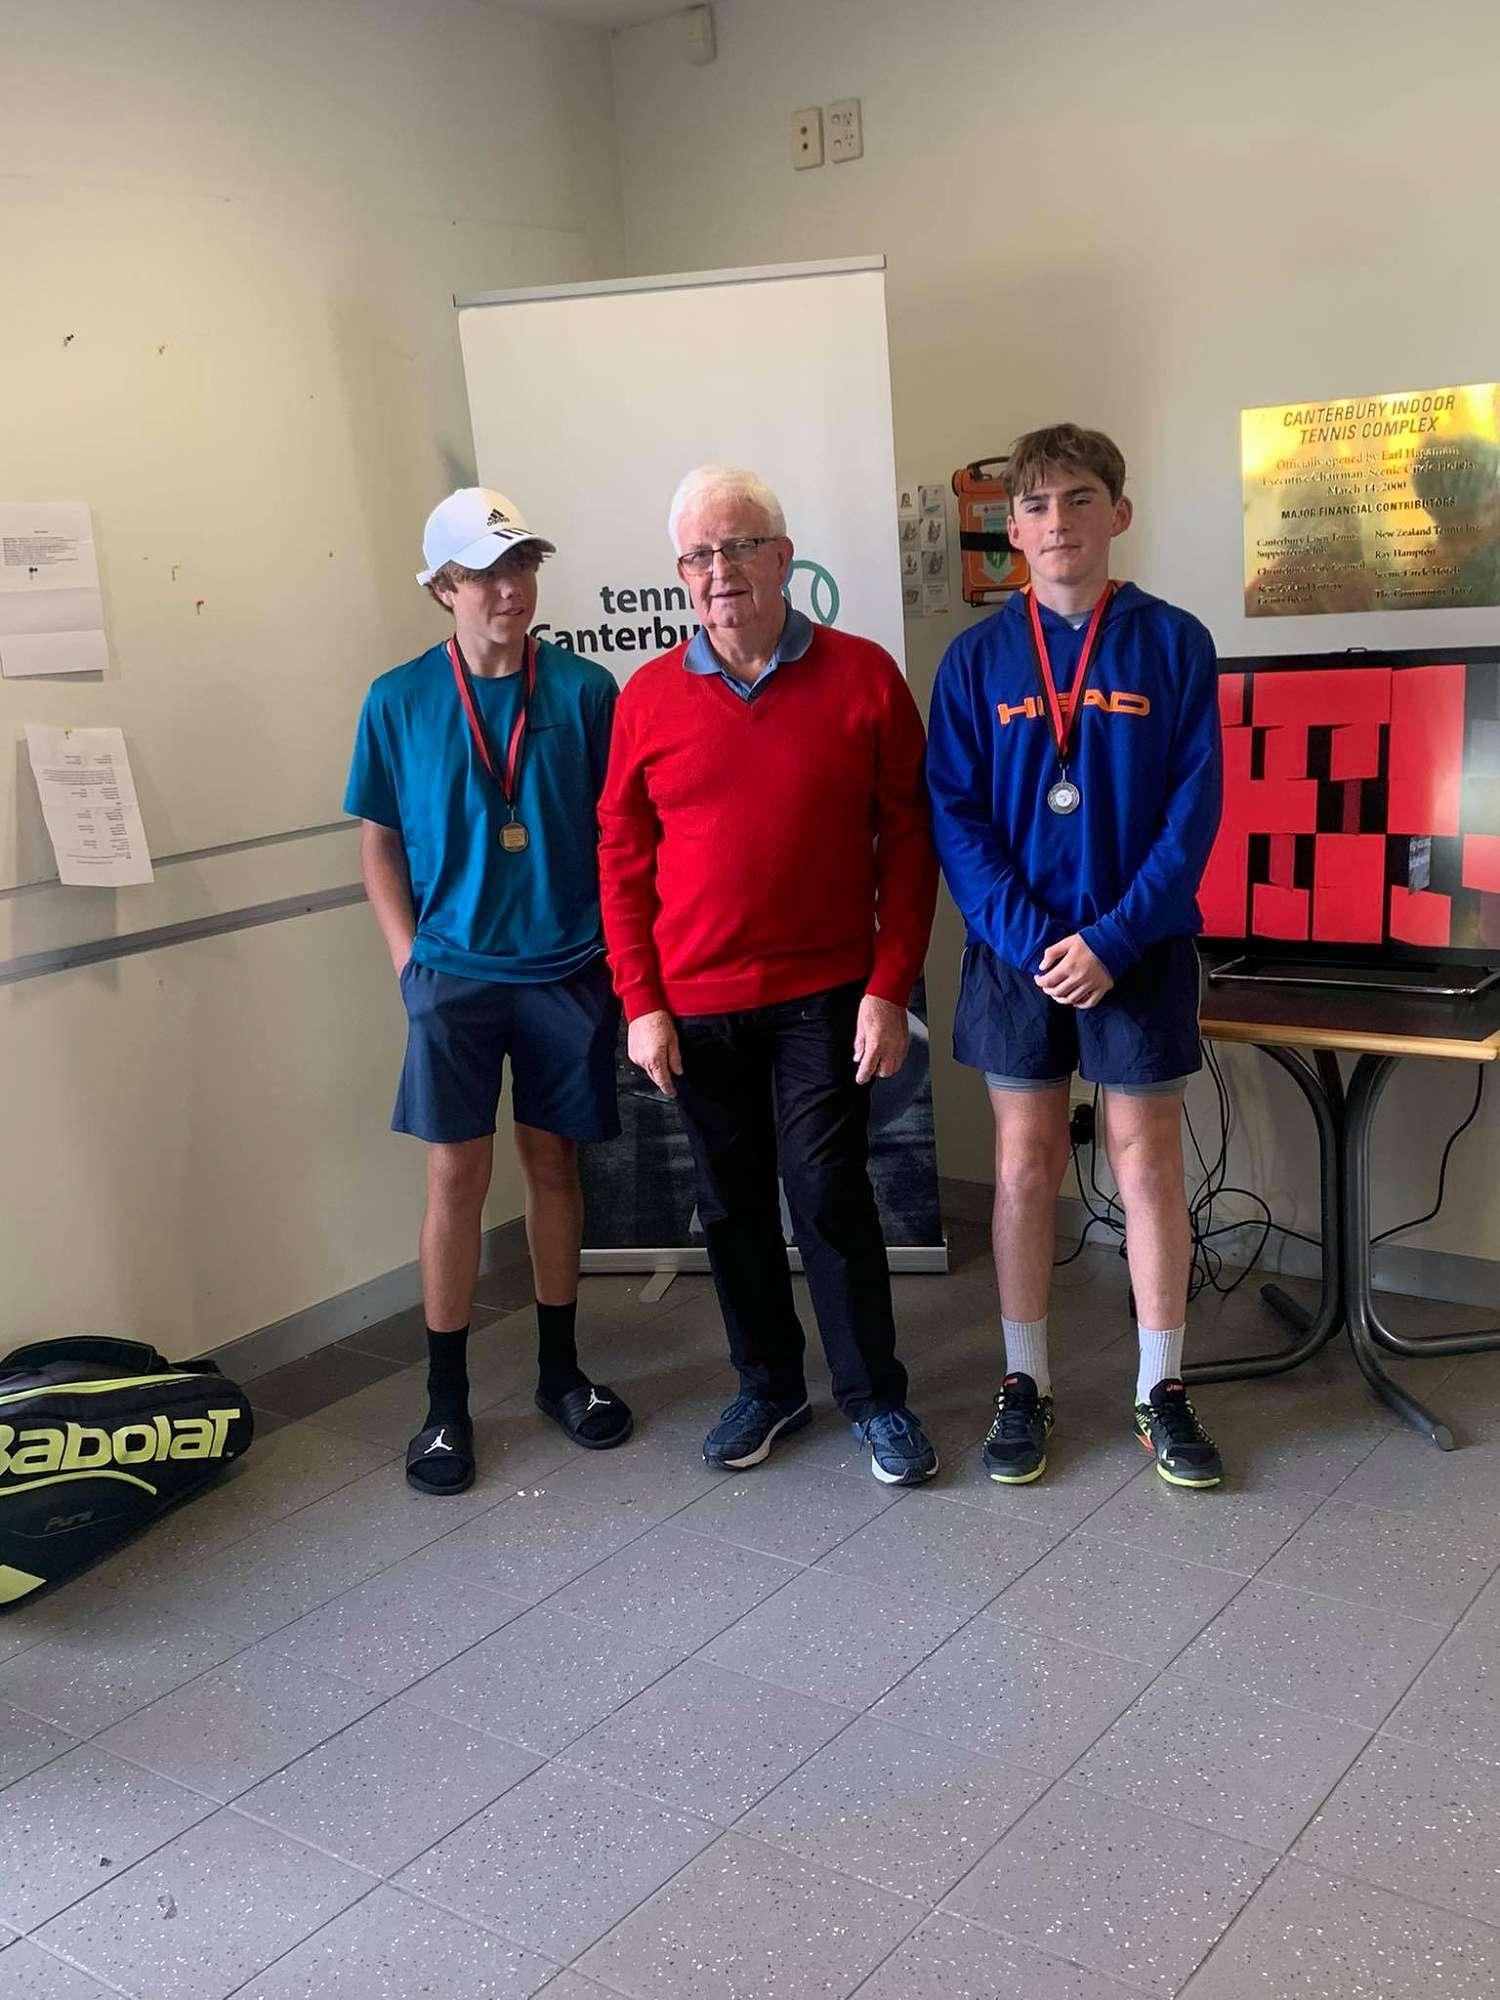 Stanley Vercoe (left) U14 boys Christchurch tennis tournament